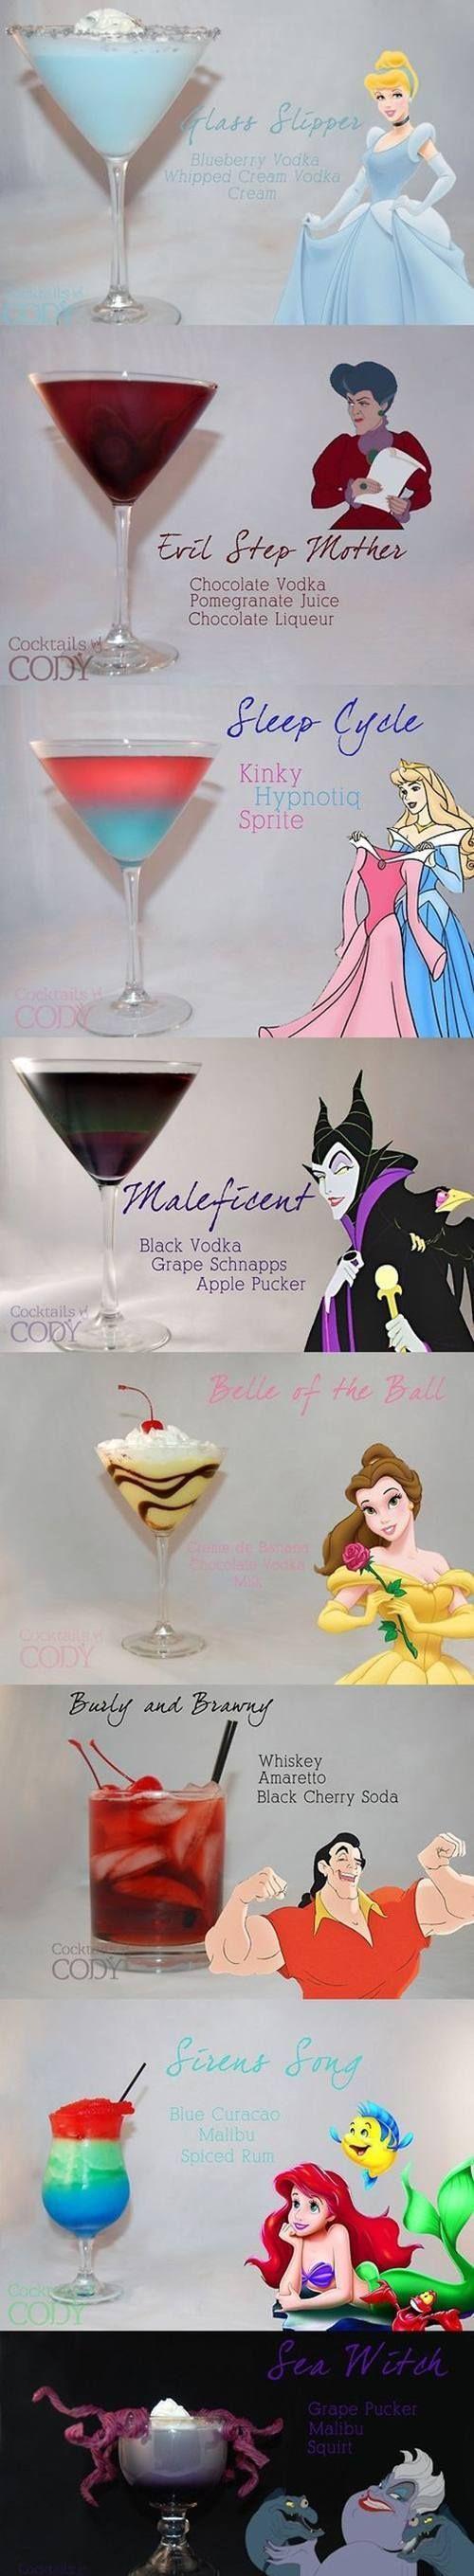 /D4U/ Disney princess and Disney villain inspired drinks - pure. brilliance.